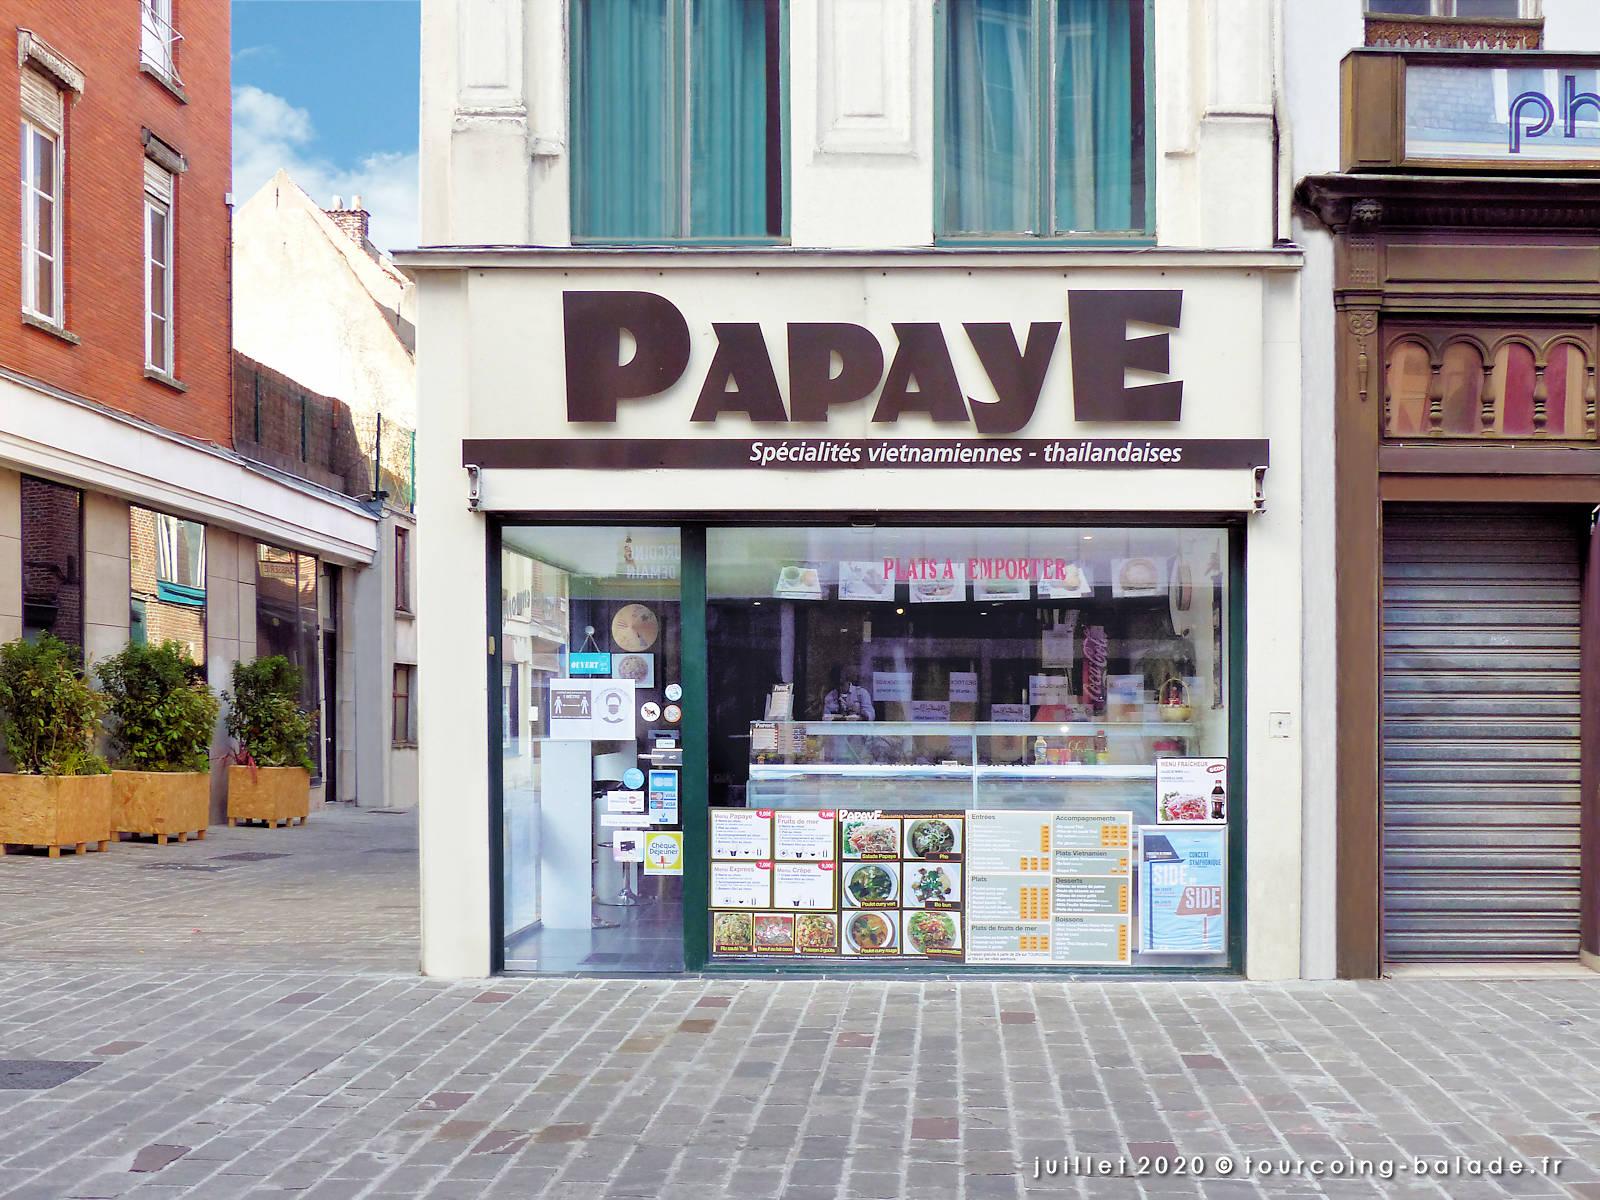 Façade du Restaurant Papaye, Tourcoing 2020